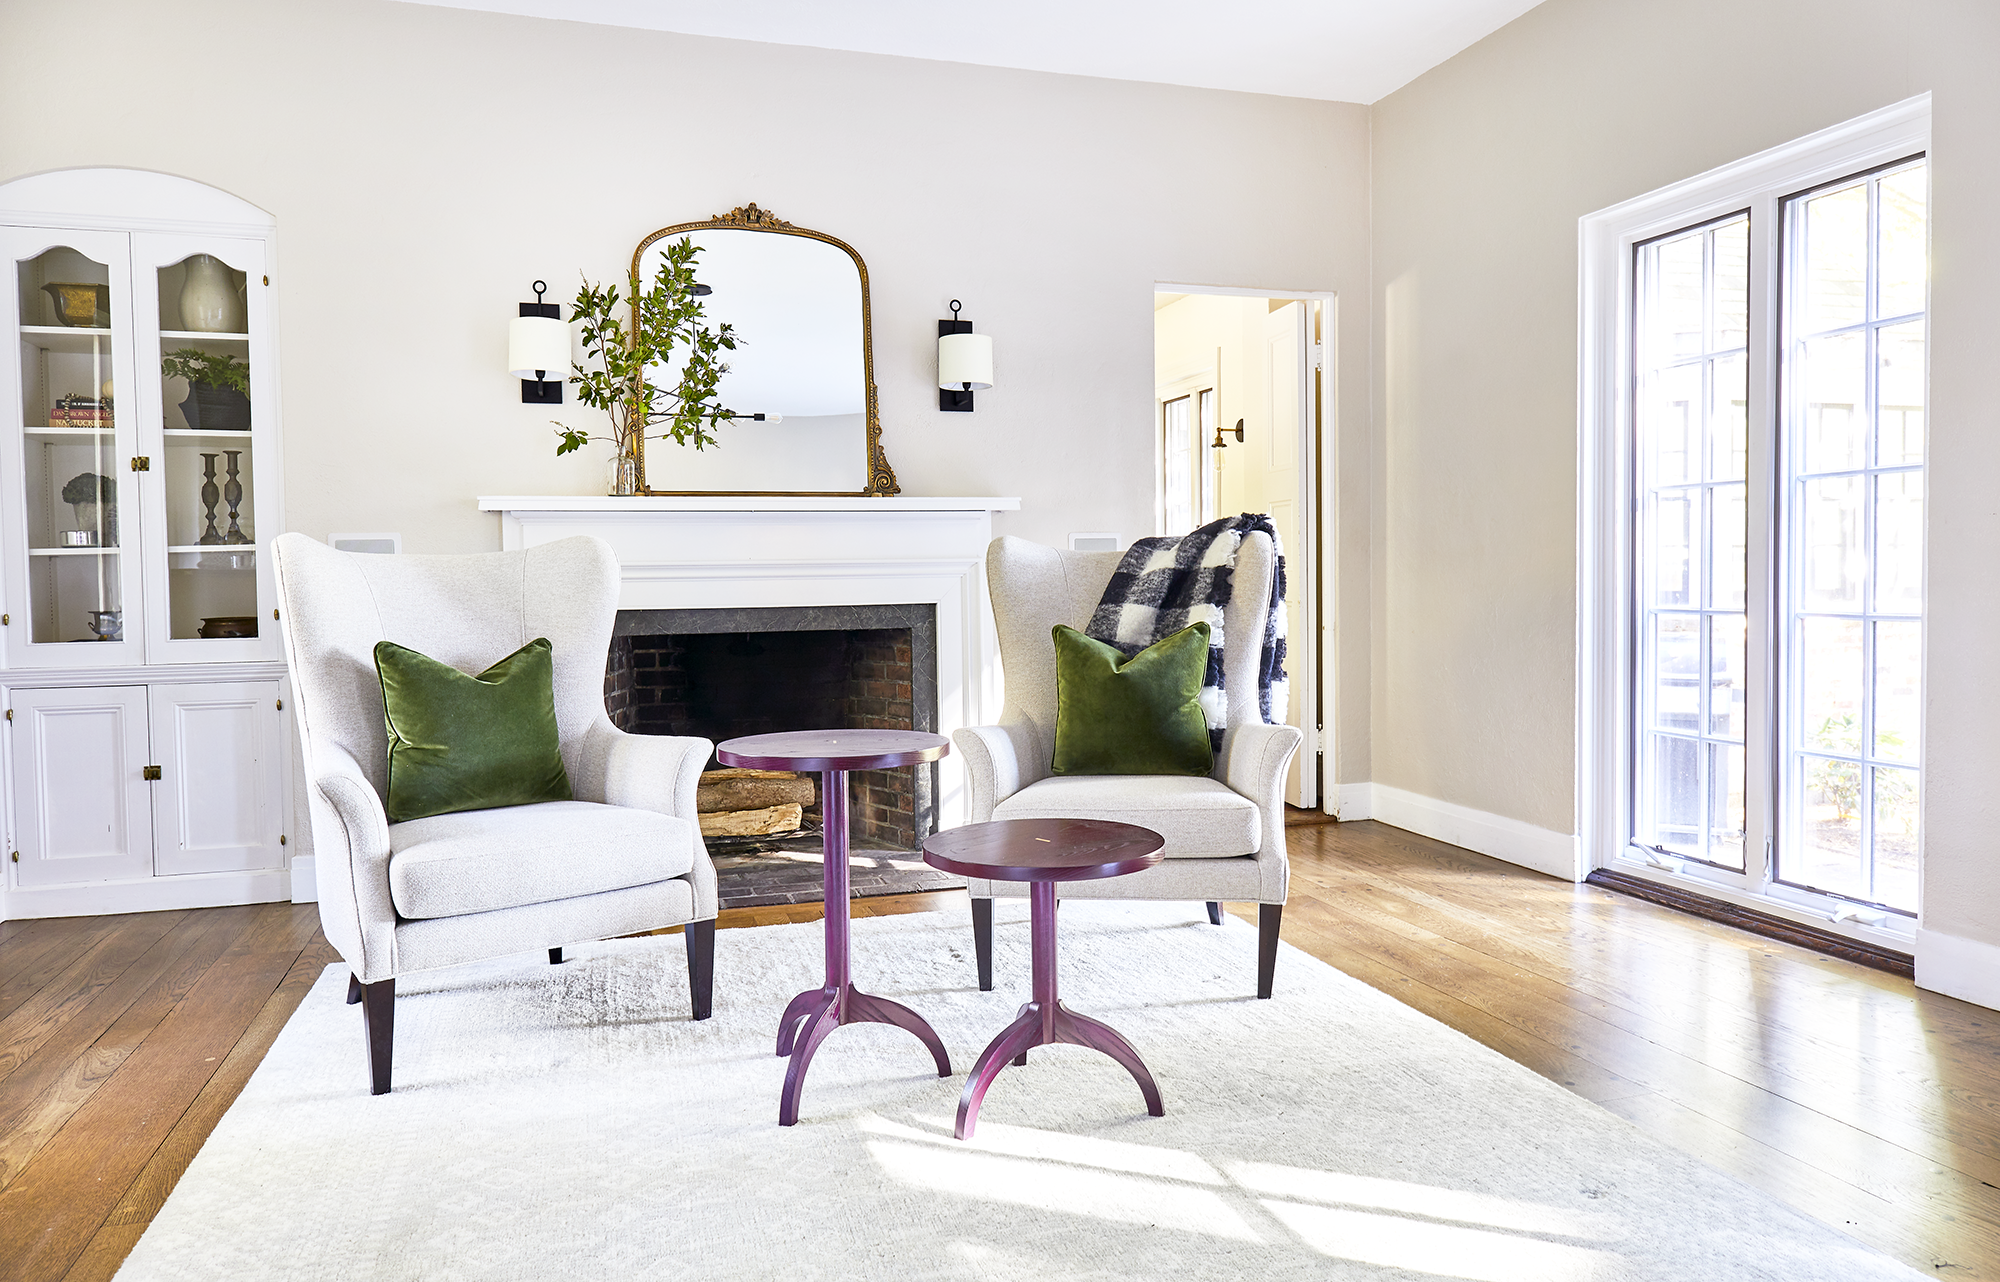 mackenzie-and-company-boston-interior-design-living-room-ideas-1